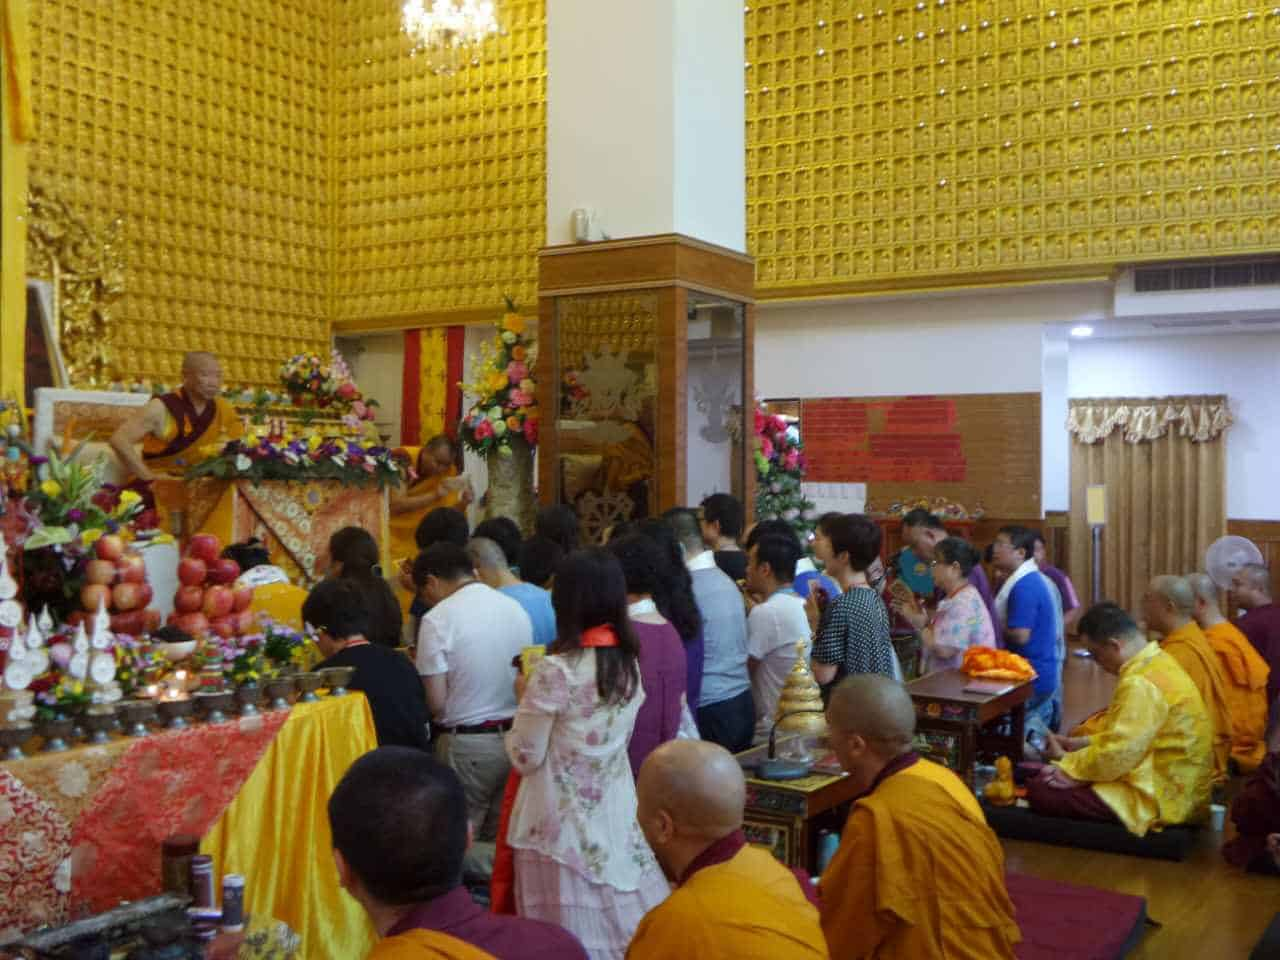 gosok-rinpoche-2016-10-66a93b69492be28bf18cace44a1182f1_